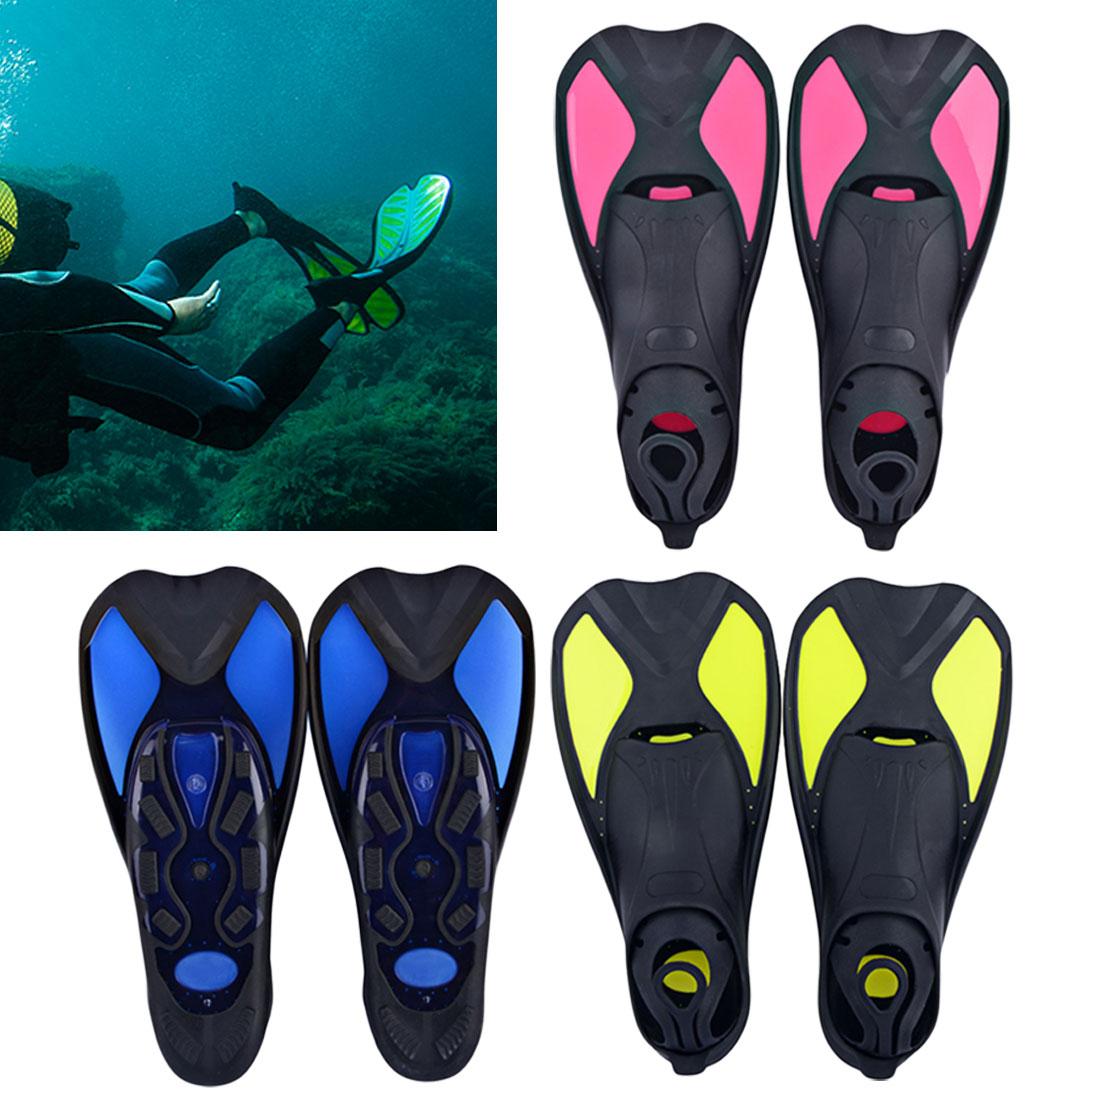 1 Pair Diving Swimming Fins Snorkeling Foot Flipper Flexible Comfort Adult Kids Short Frog Shoes Beginner Swimming Equipment